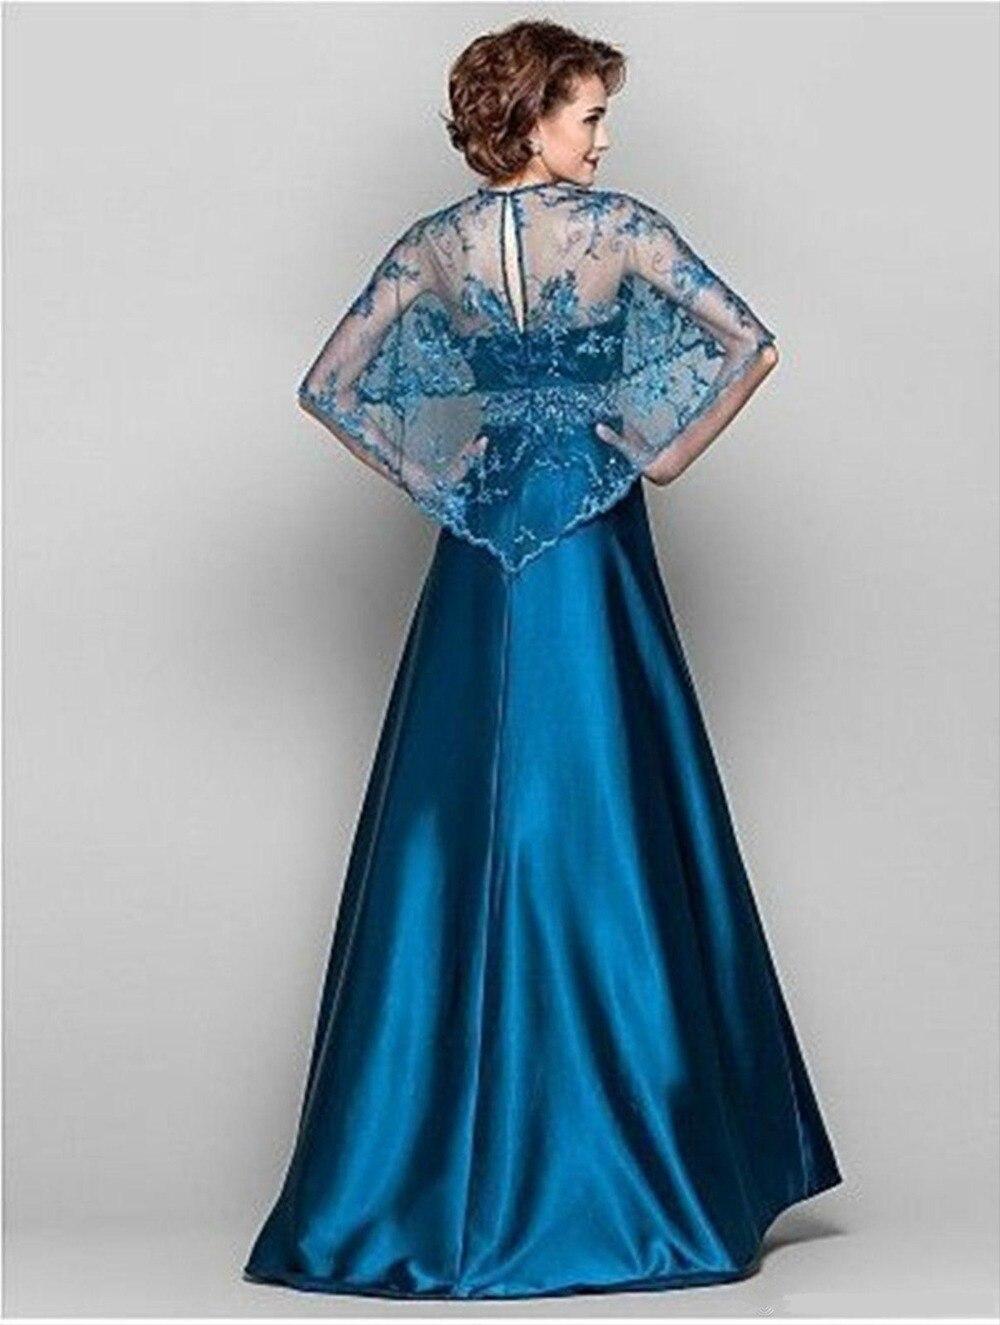 Amazing Petite Plus Size Mother Of The Bride Dresses Image ...